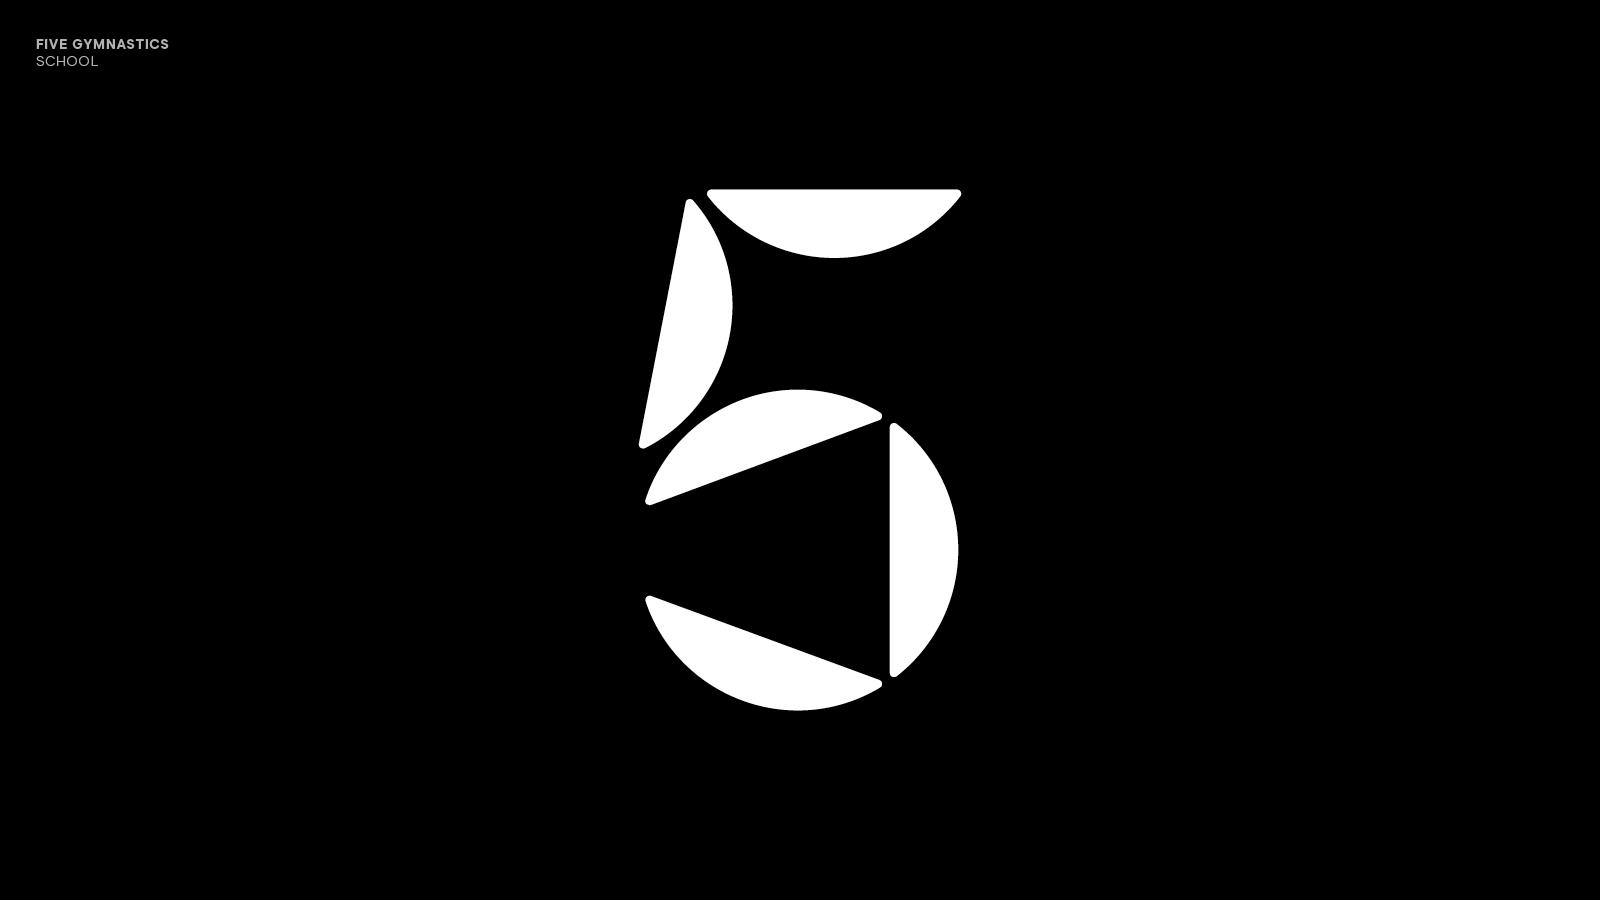 logos-designer-brand-identity-projects-graphics-studio-milton-keynes-london-10